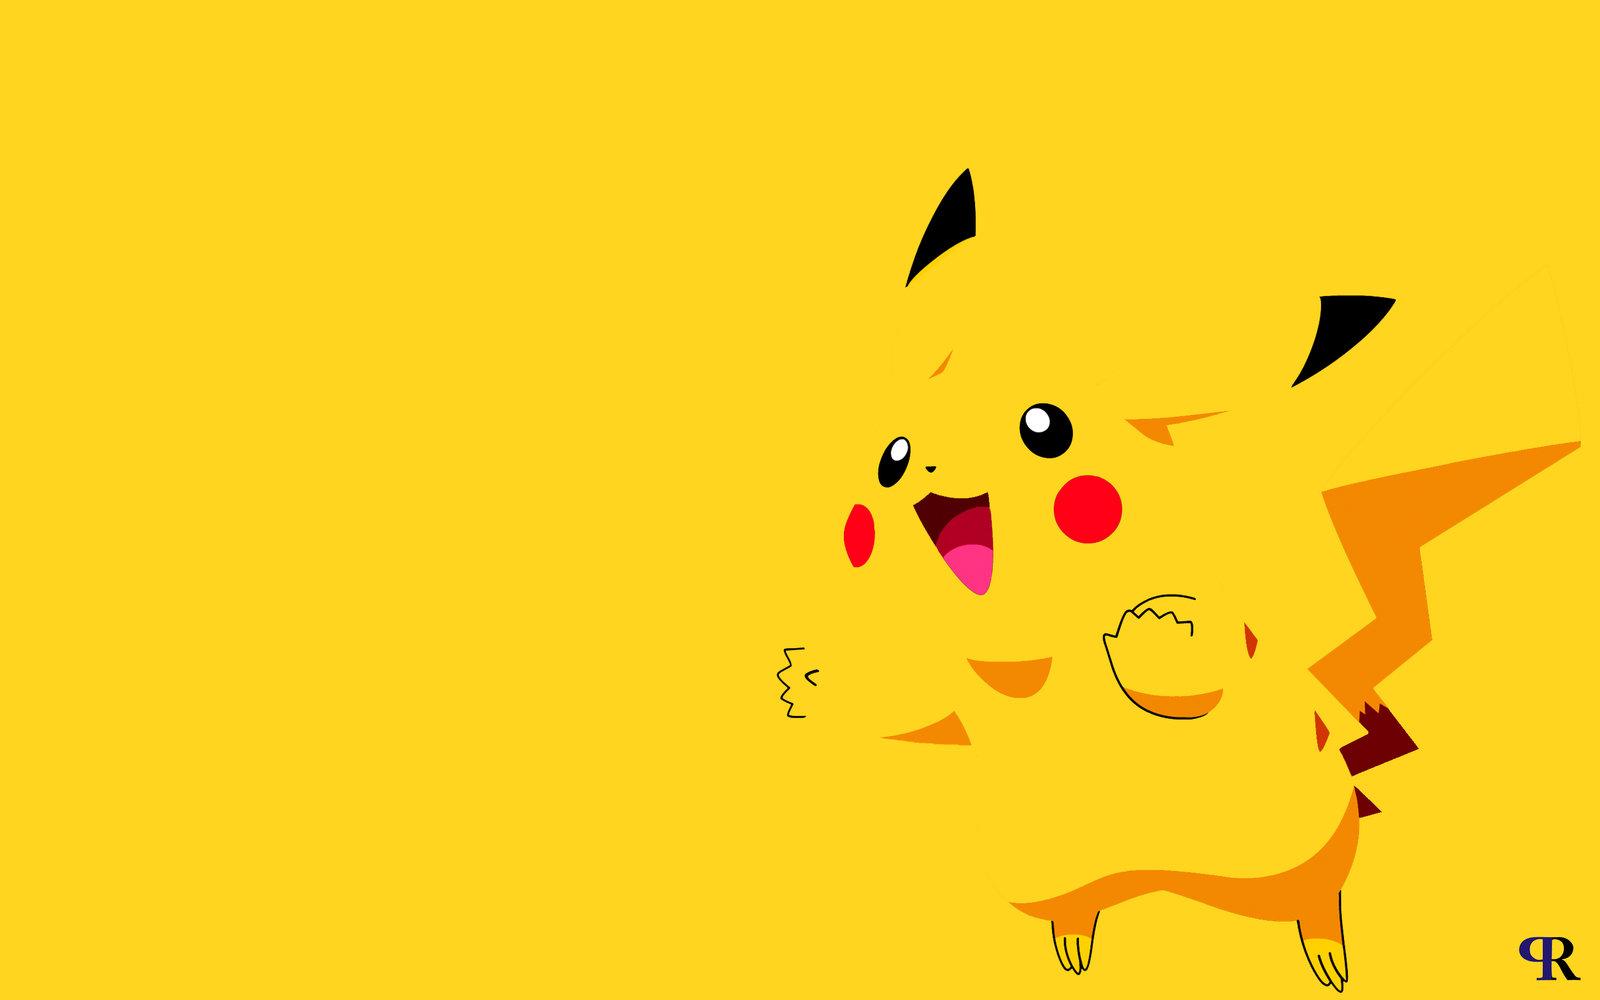 Pikachu Wallpaper - Wa...